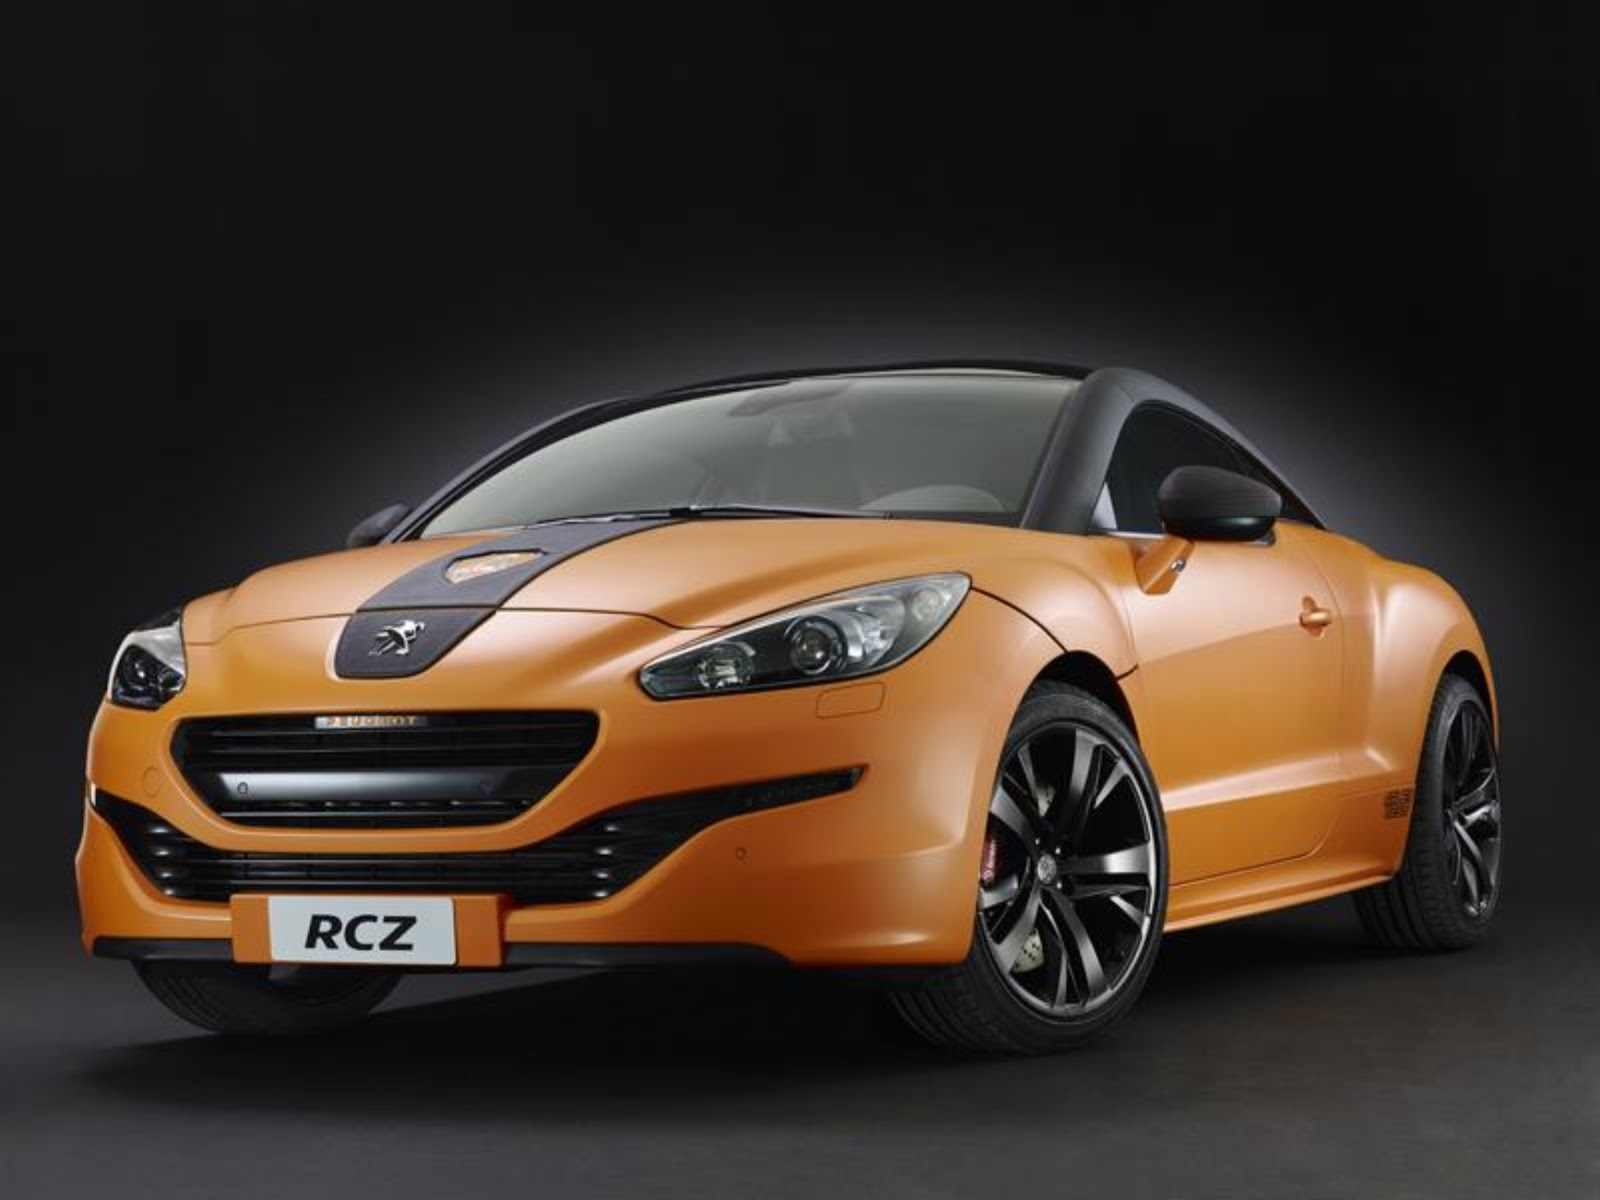 All Cars Nz 2013 Peugeot Rcz Arlen Ness